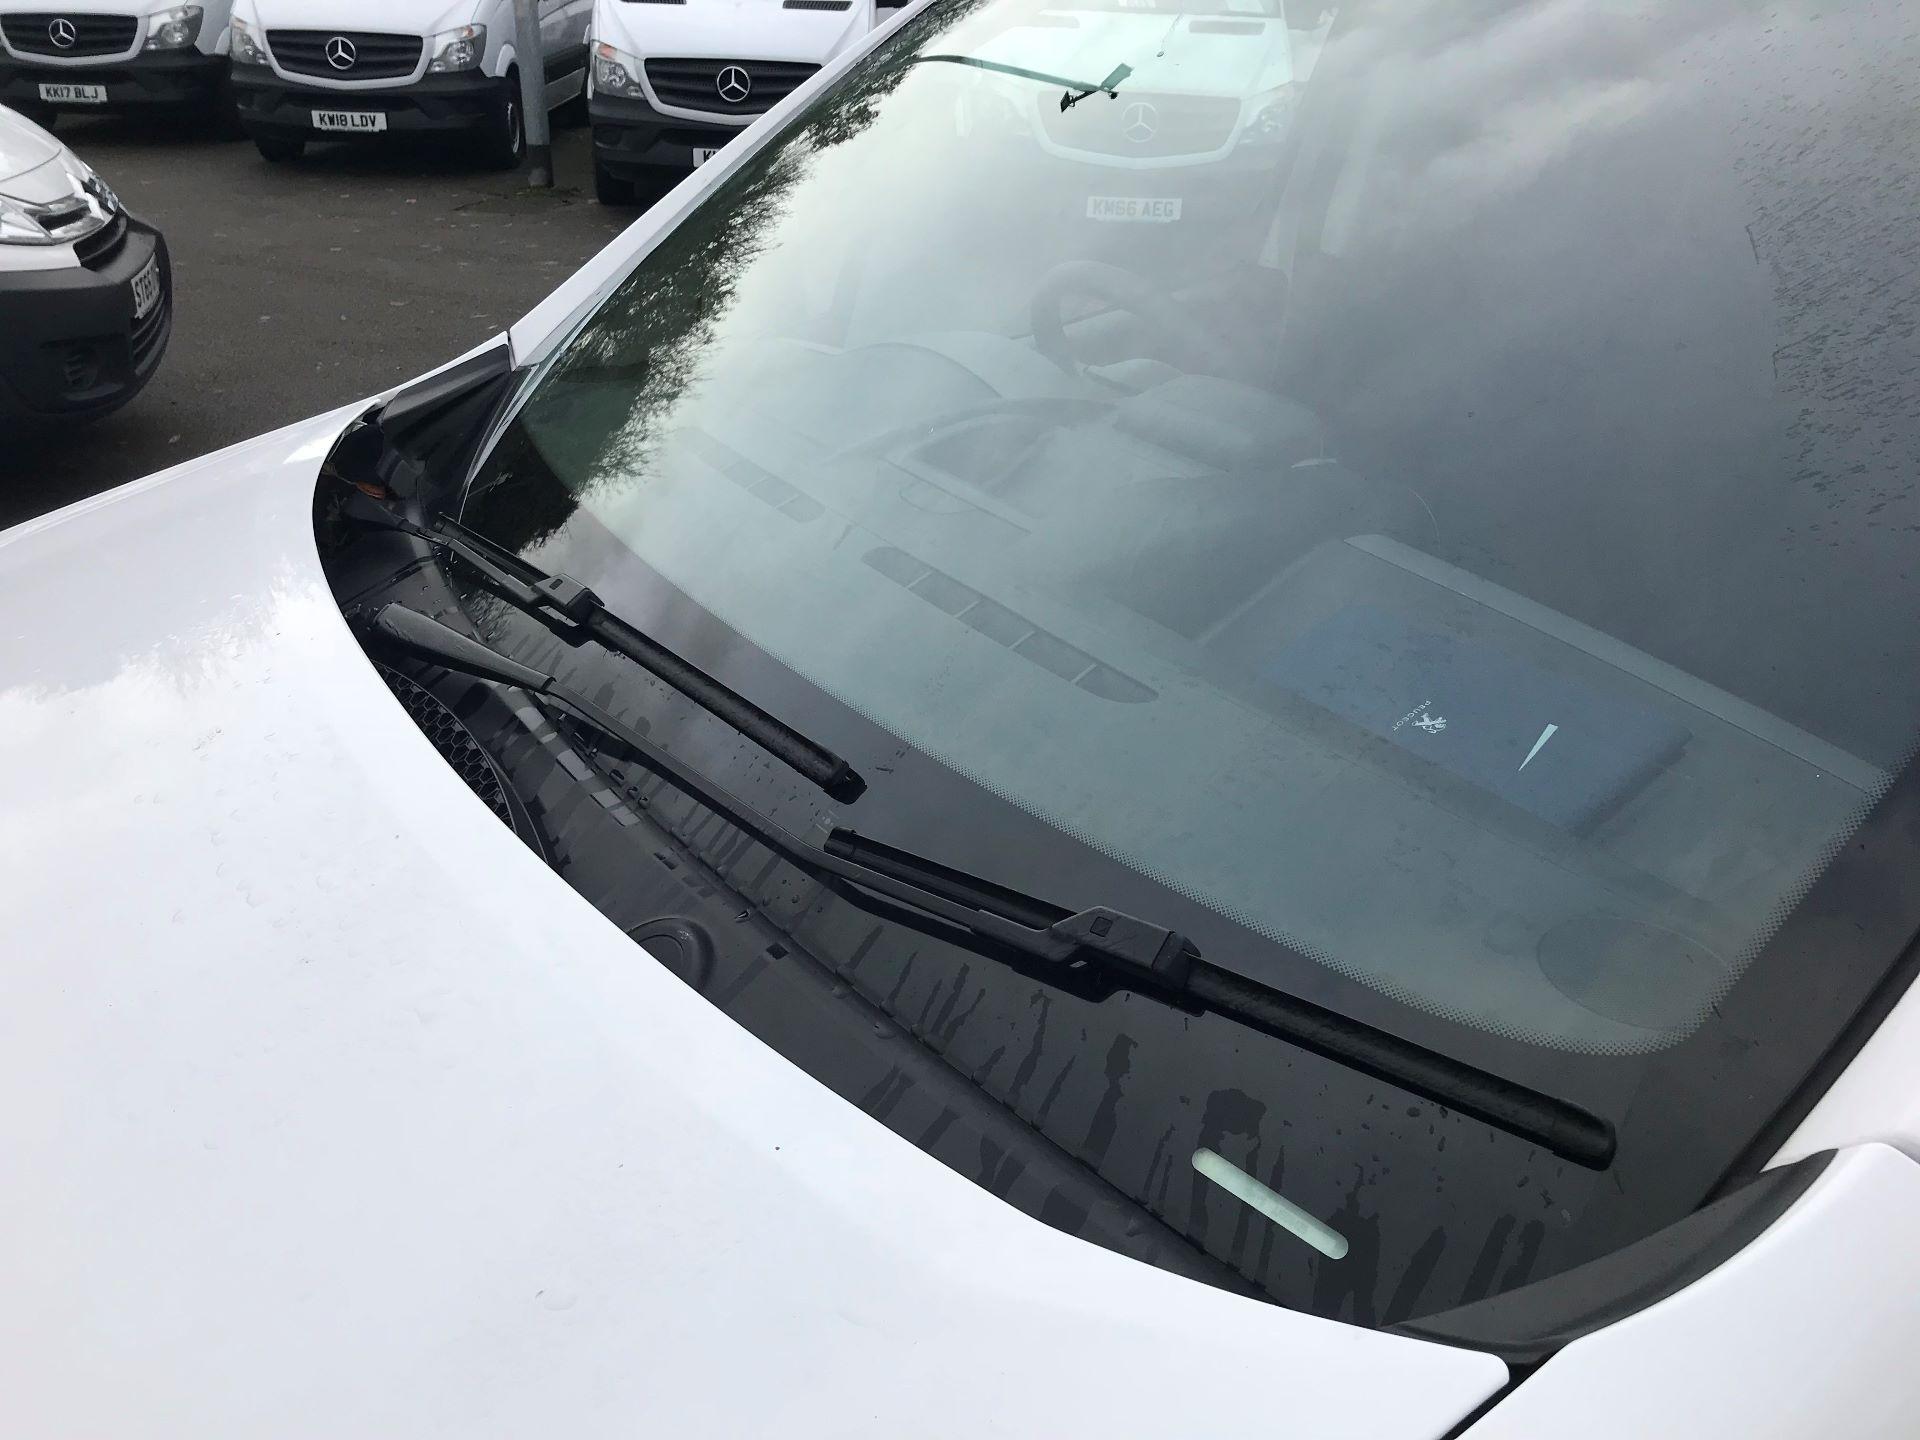 2018 Peugeot Partner L1 850 1.6 BLUEHDI 100 PROFESSIONAL (NON S/S)EURO 6 (NU18DJY) Image 16